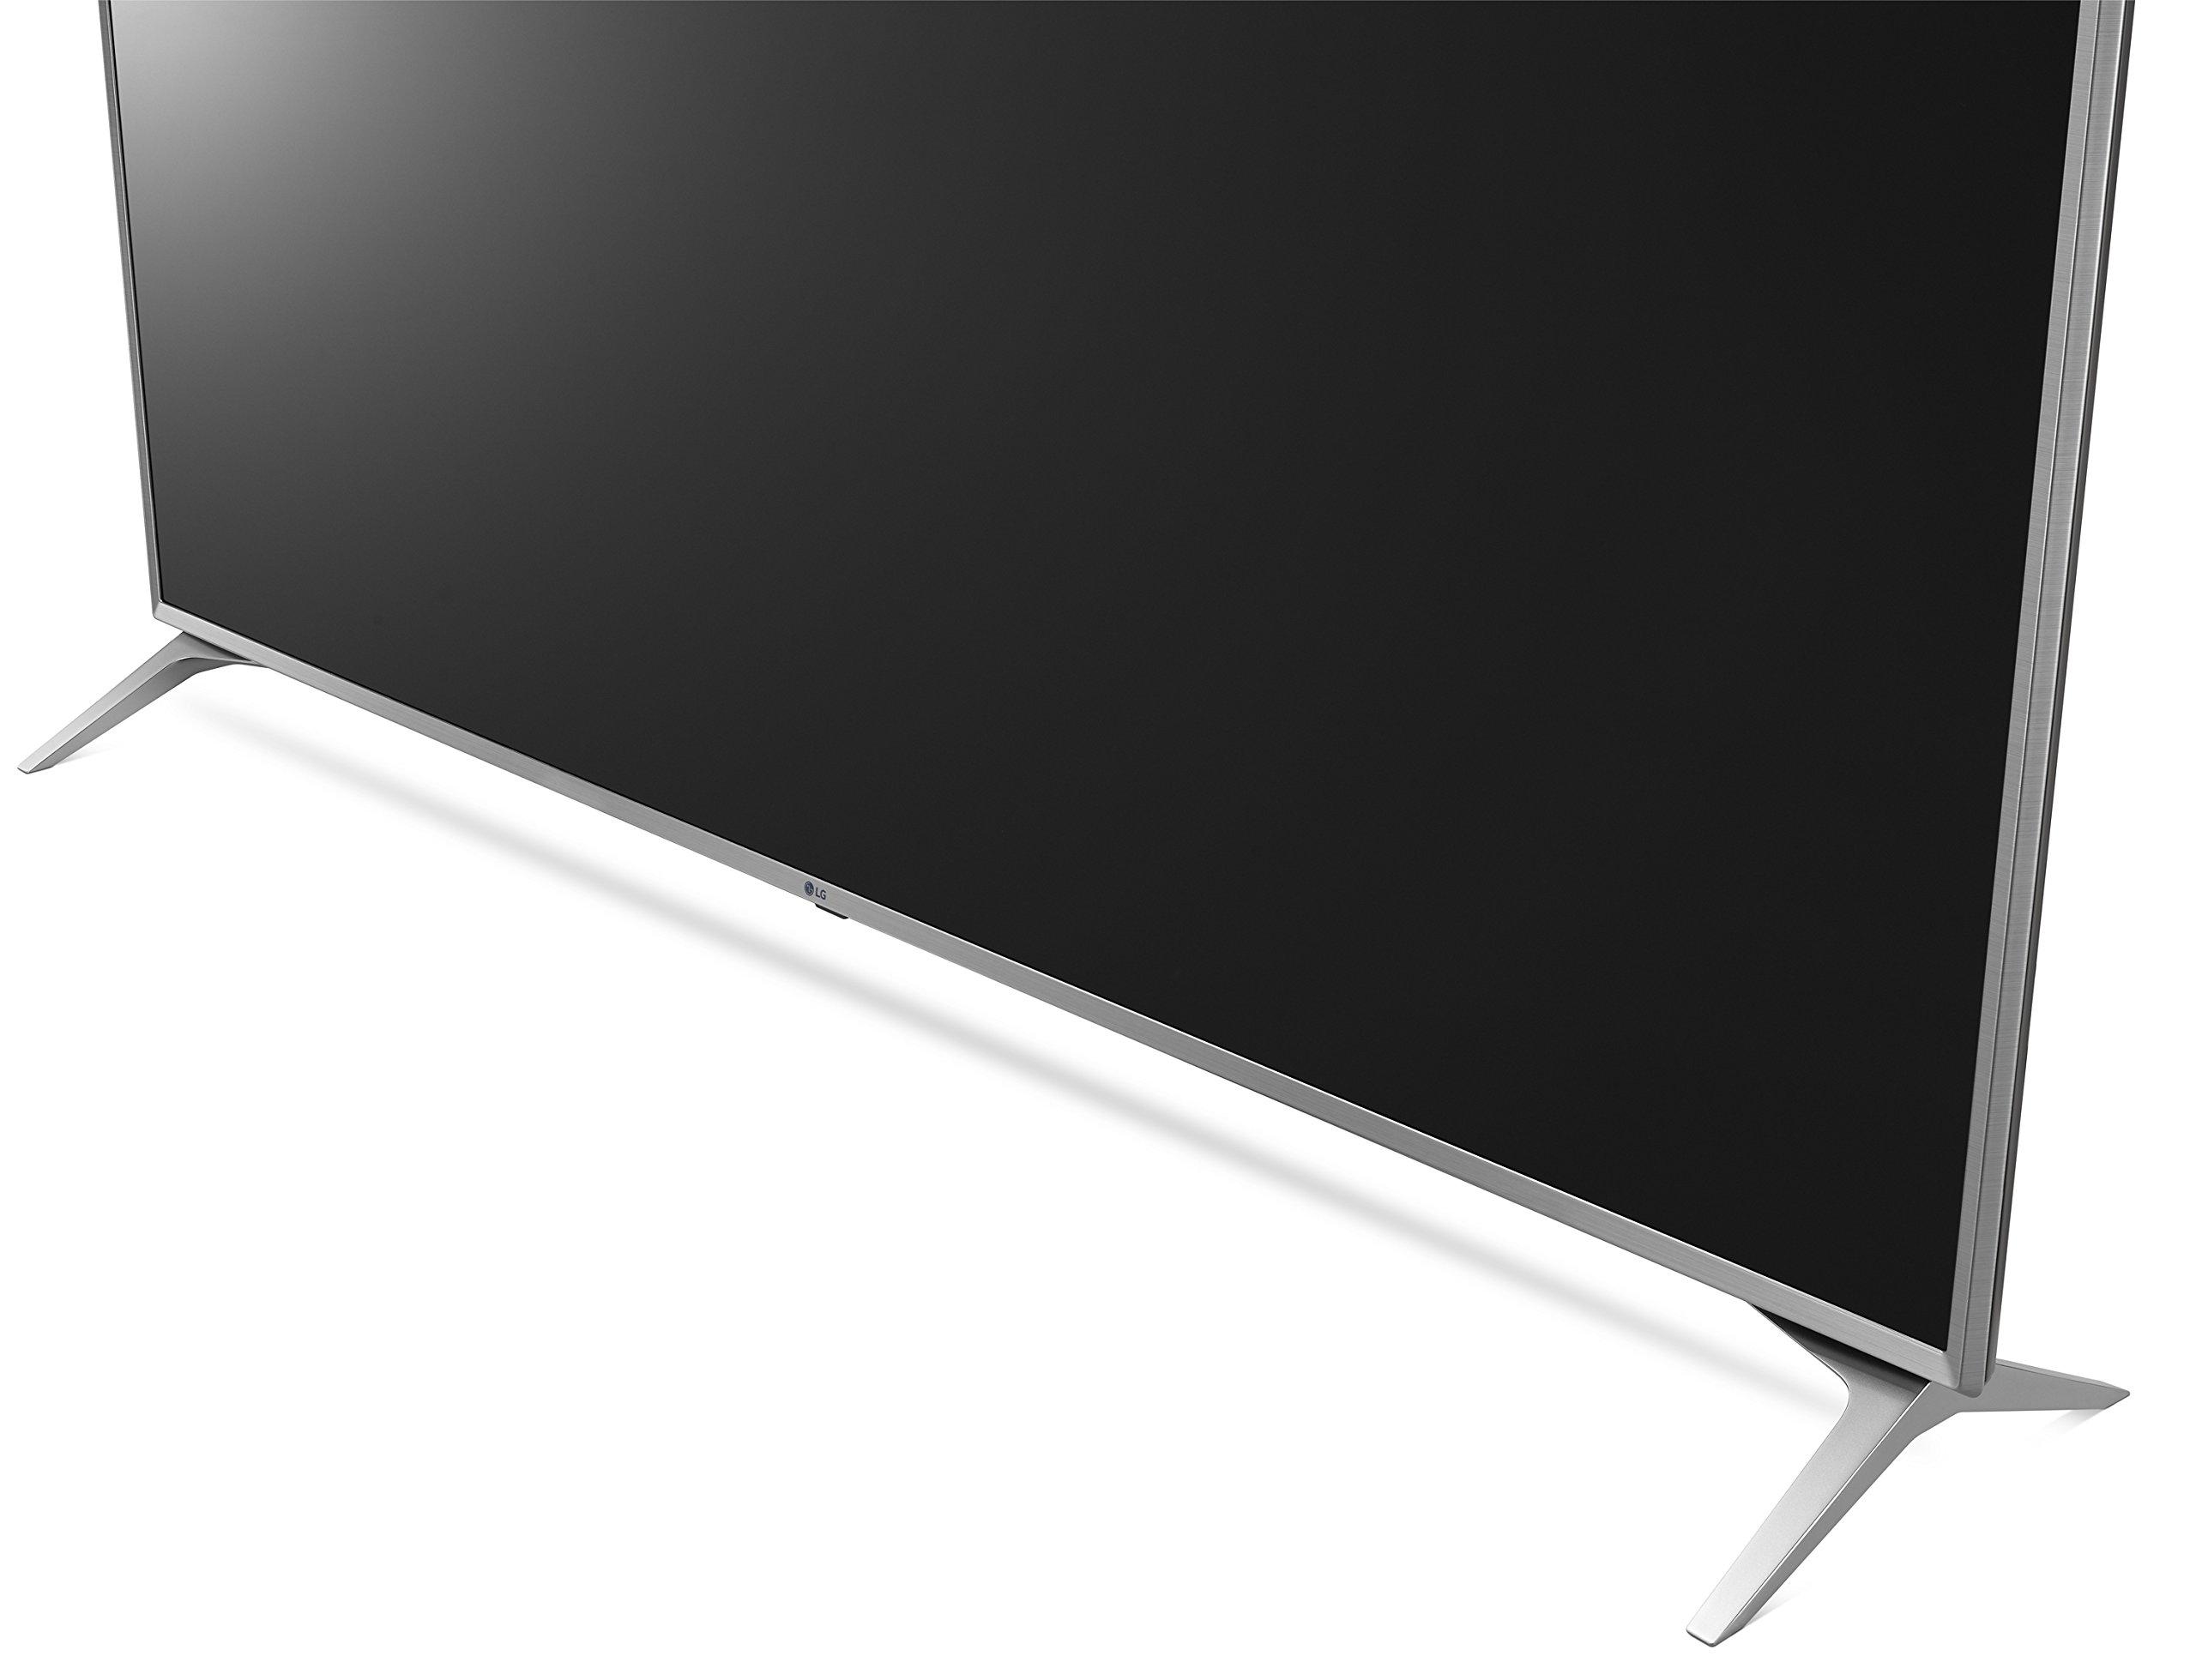 LG Electronics 70UK6570PUBUltra HD Smart LED TV (Modelo 2018): Amazon.es: Electrónica